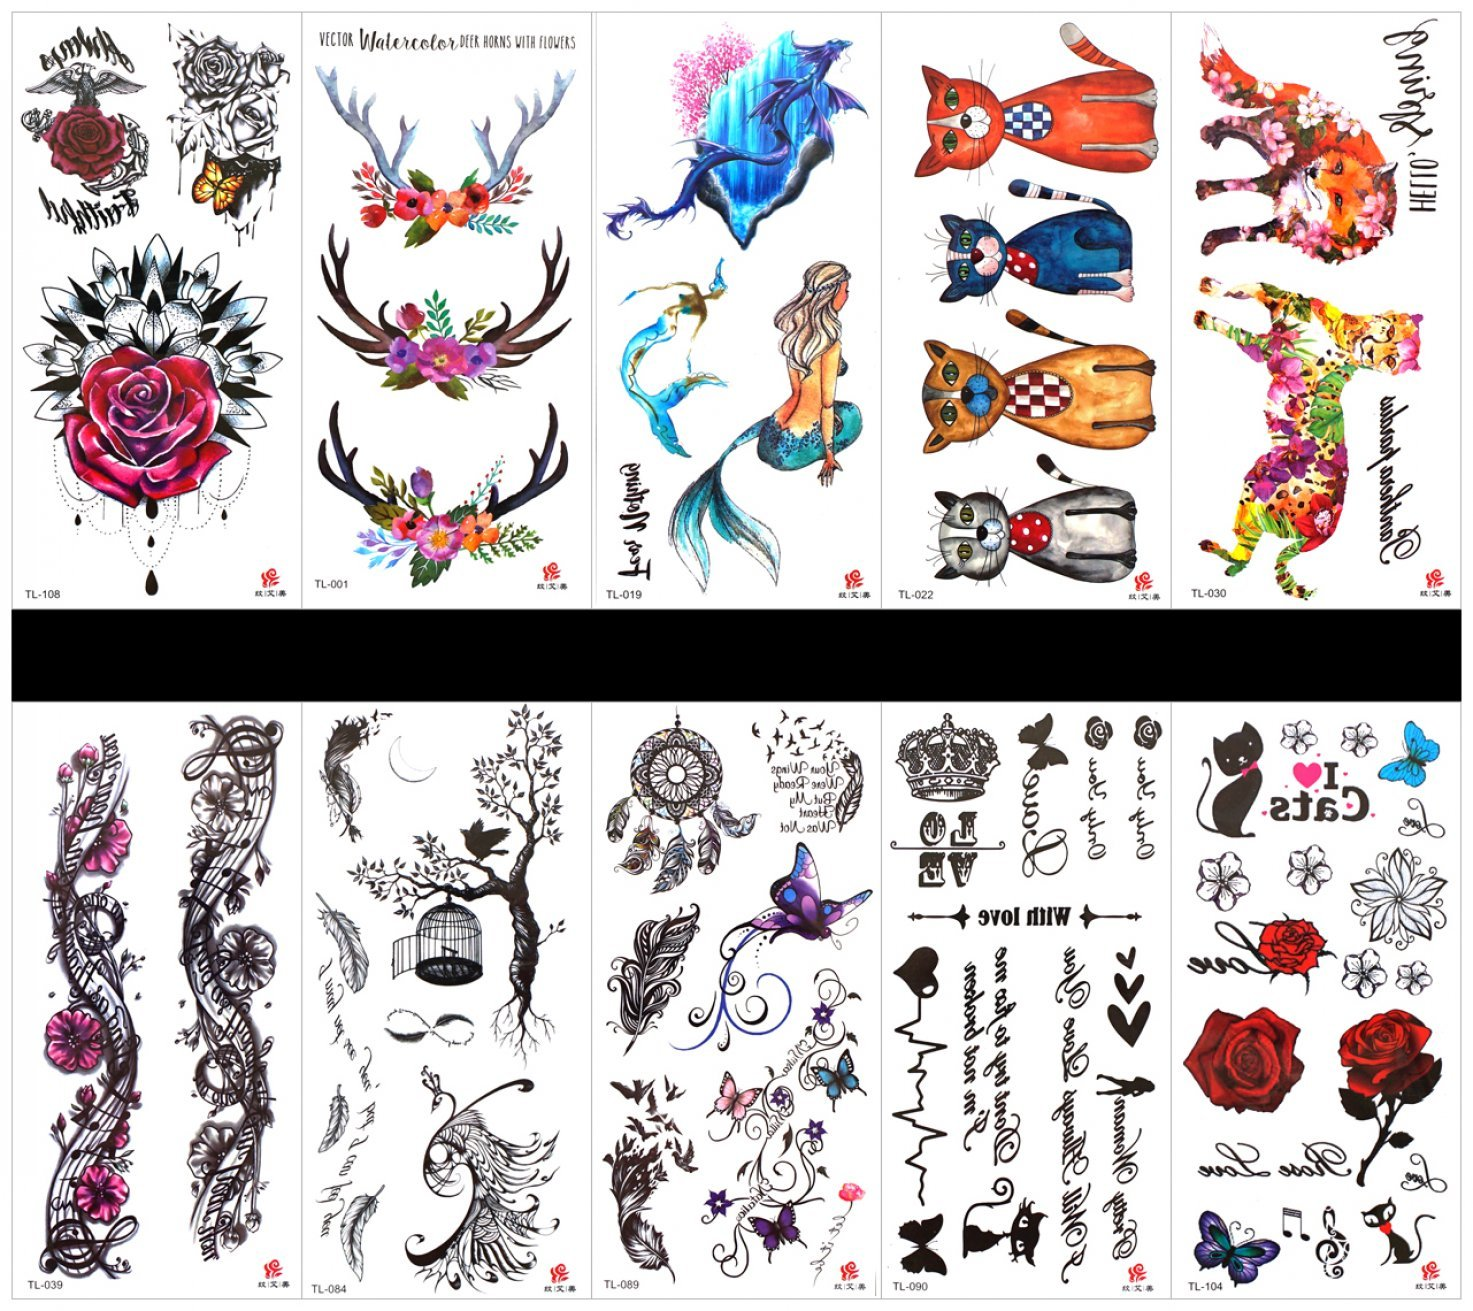 tatuajes falsos en 1 paquete, incluyendo zorro, leopardo, pluma ...